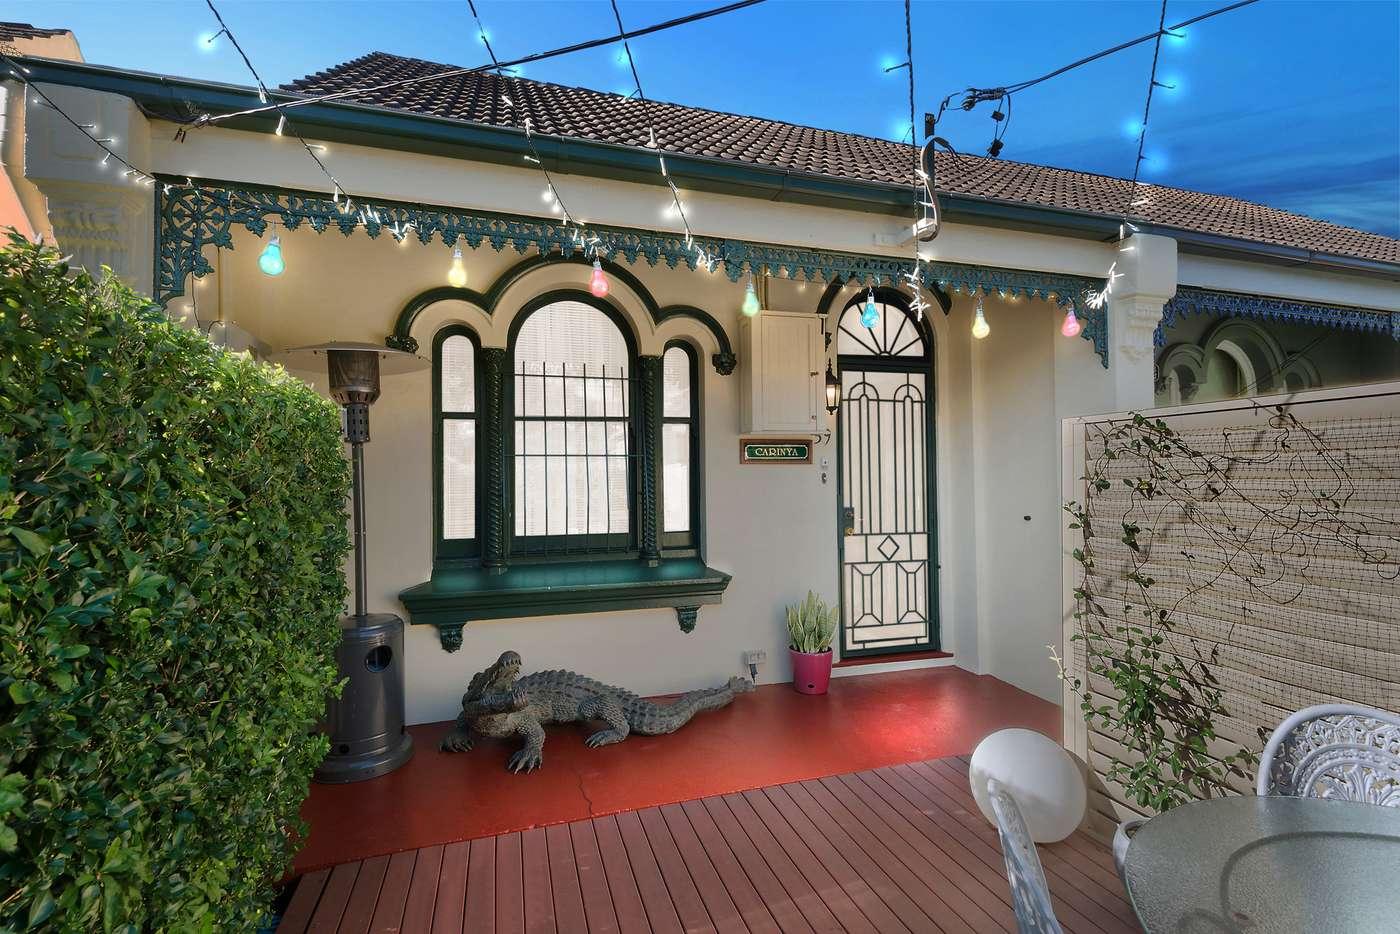 Main view of Homely semiDetached listing, 39 Croydon Road, Croydon NSW 2132